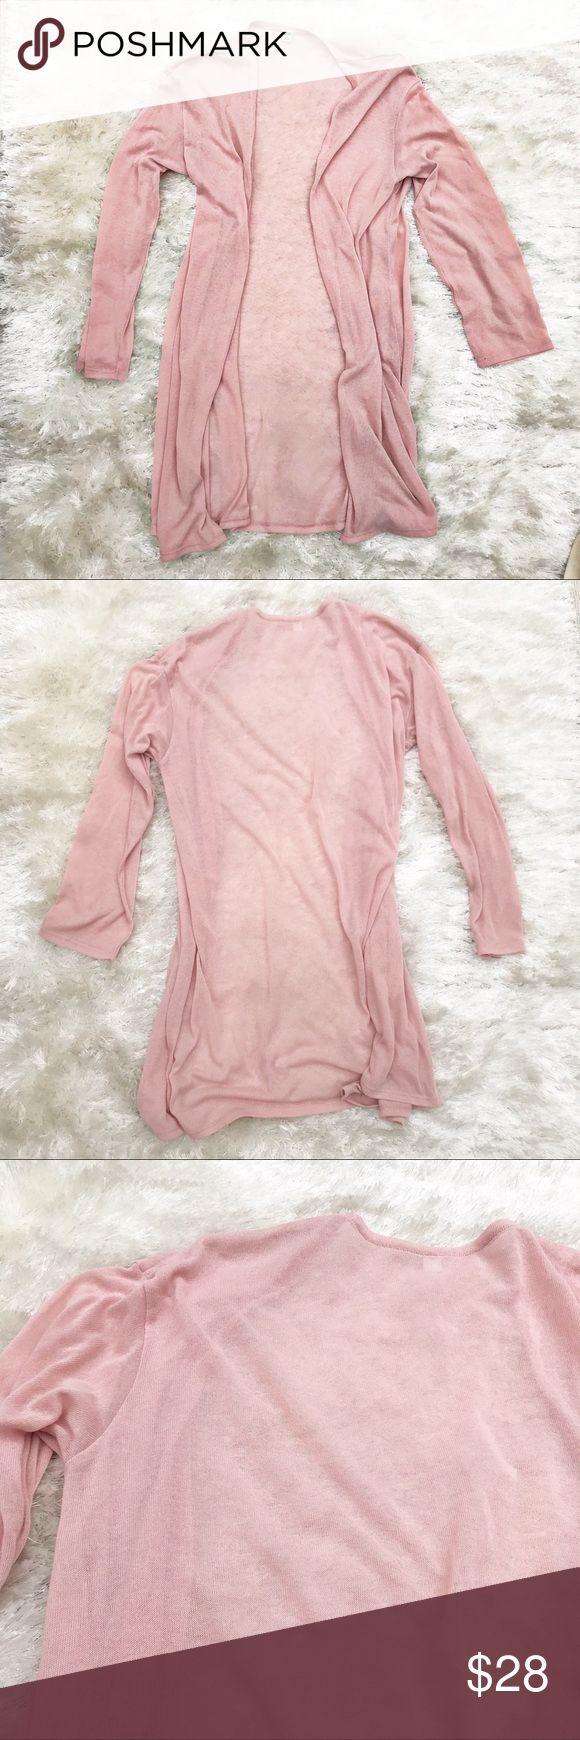 UNIQLO Blush Open Front Cardigan Blush Rose Open Front Cardigan by Uniqlo. Flowy, long cardigan in on-trend color. Size medium. Uniqlo Sweaters Cardigans